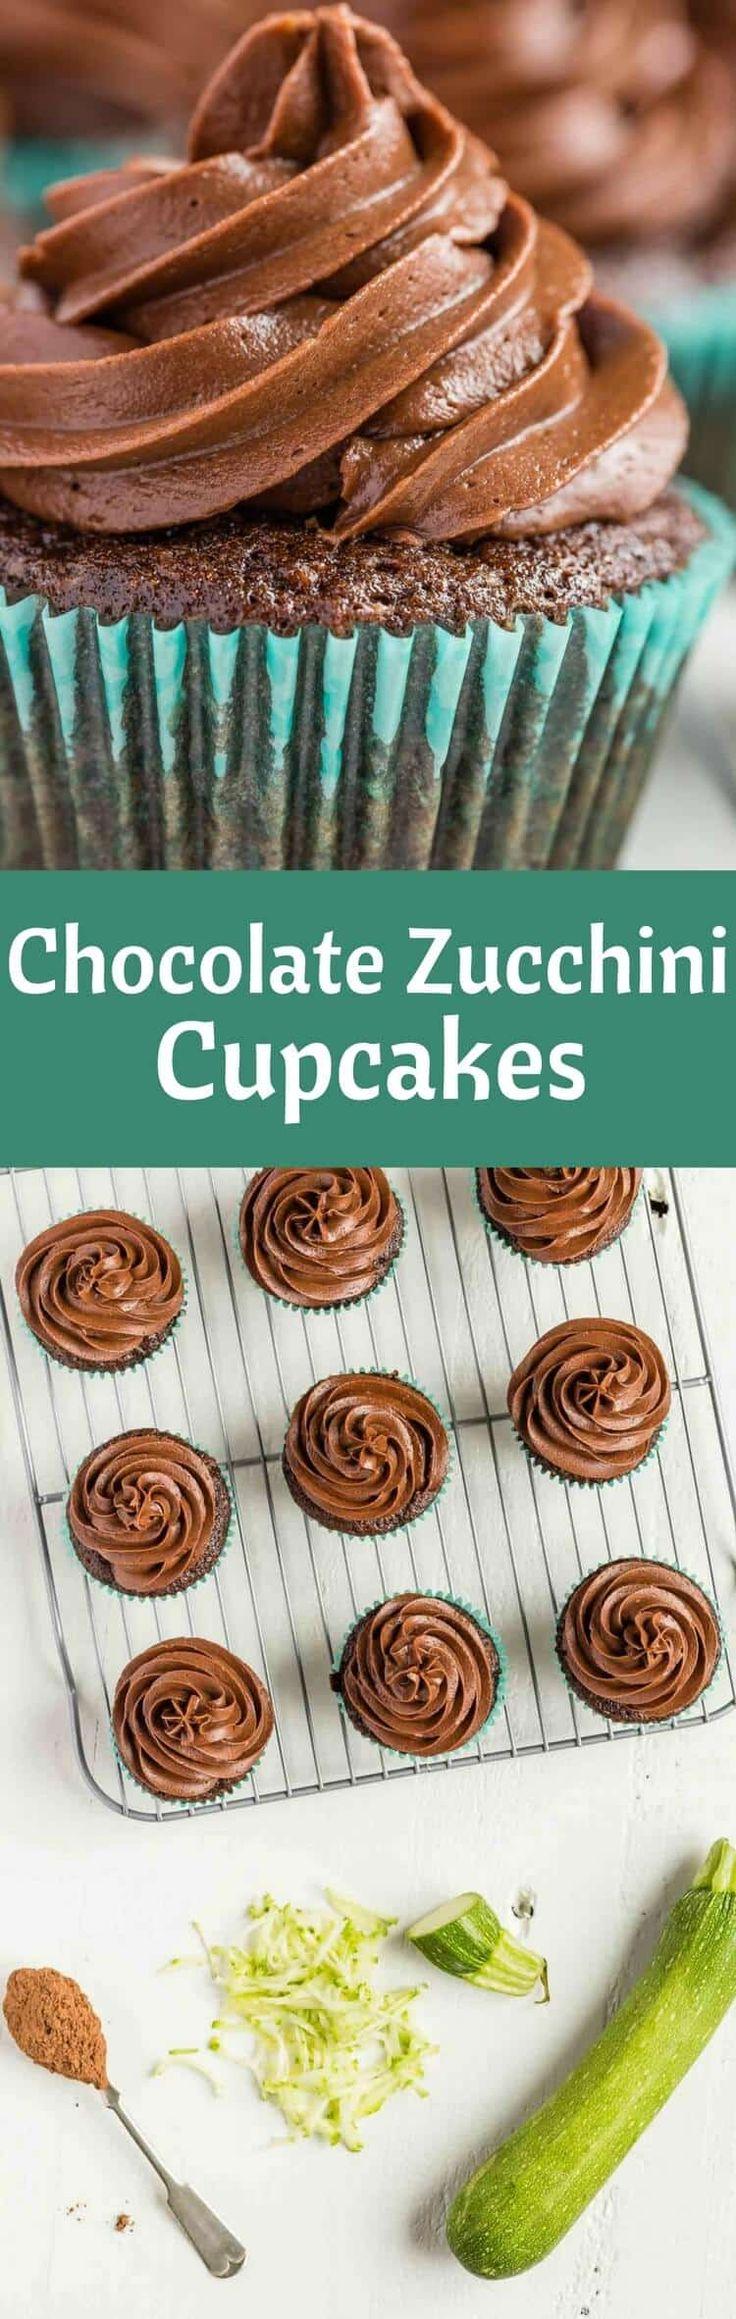 Chocolate Zucchini Cupcakes | Dessert | Cupcakes via @introvertbaker